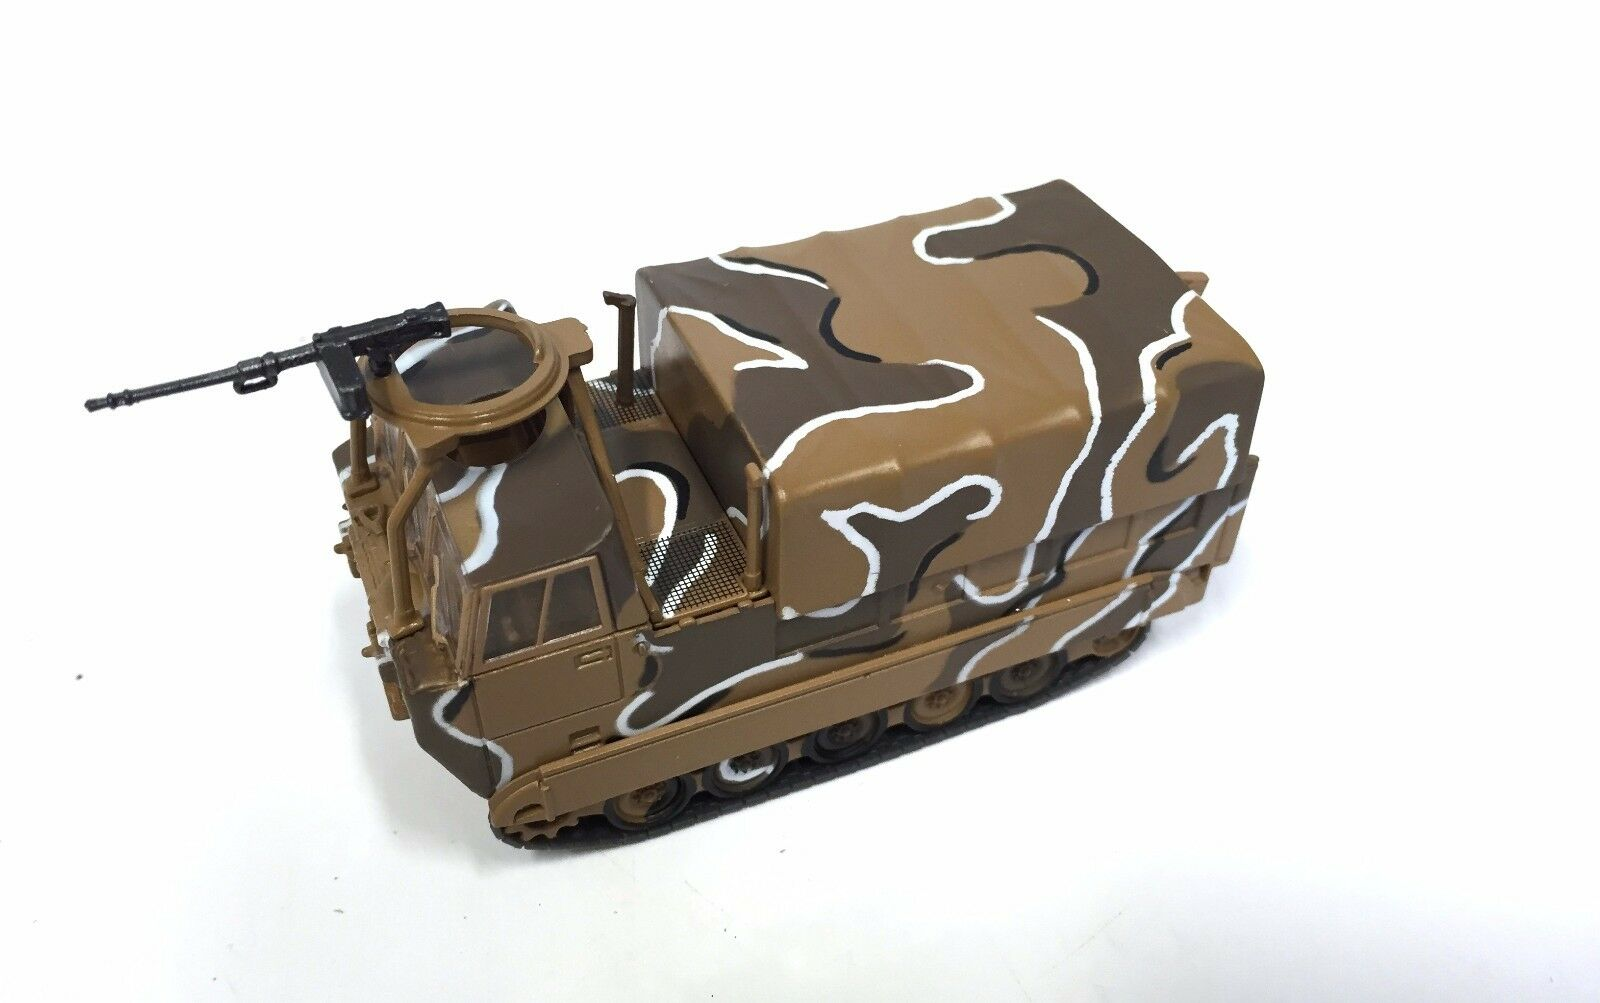 M548 A1 USA ARMY MILITARY VEHICLE 1 72 SCALE - DIECAST TANK PANZER GUN 28